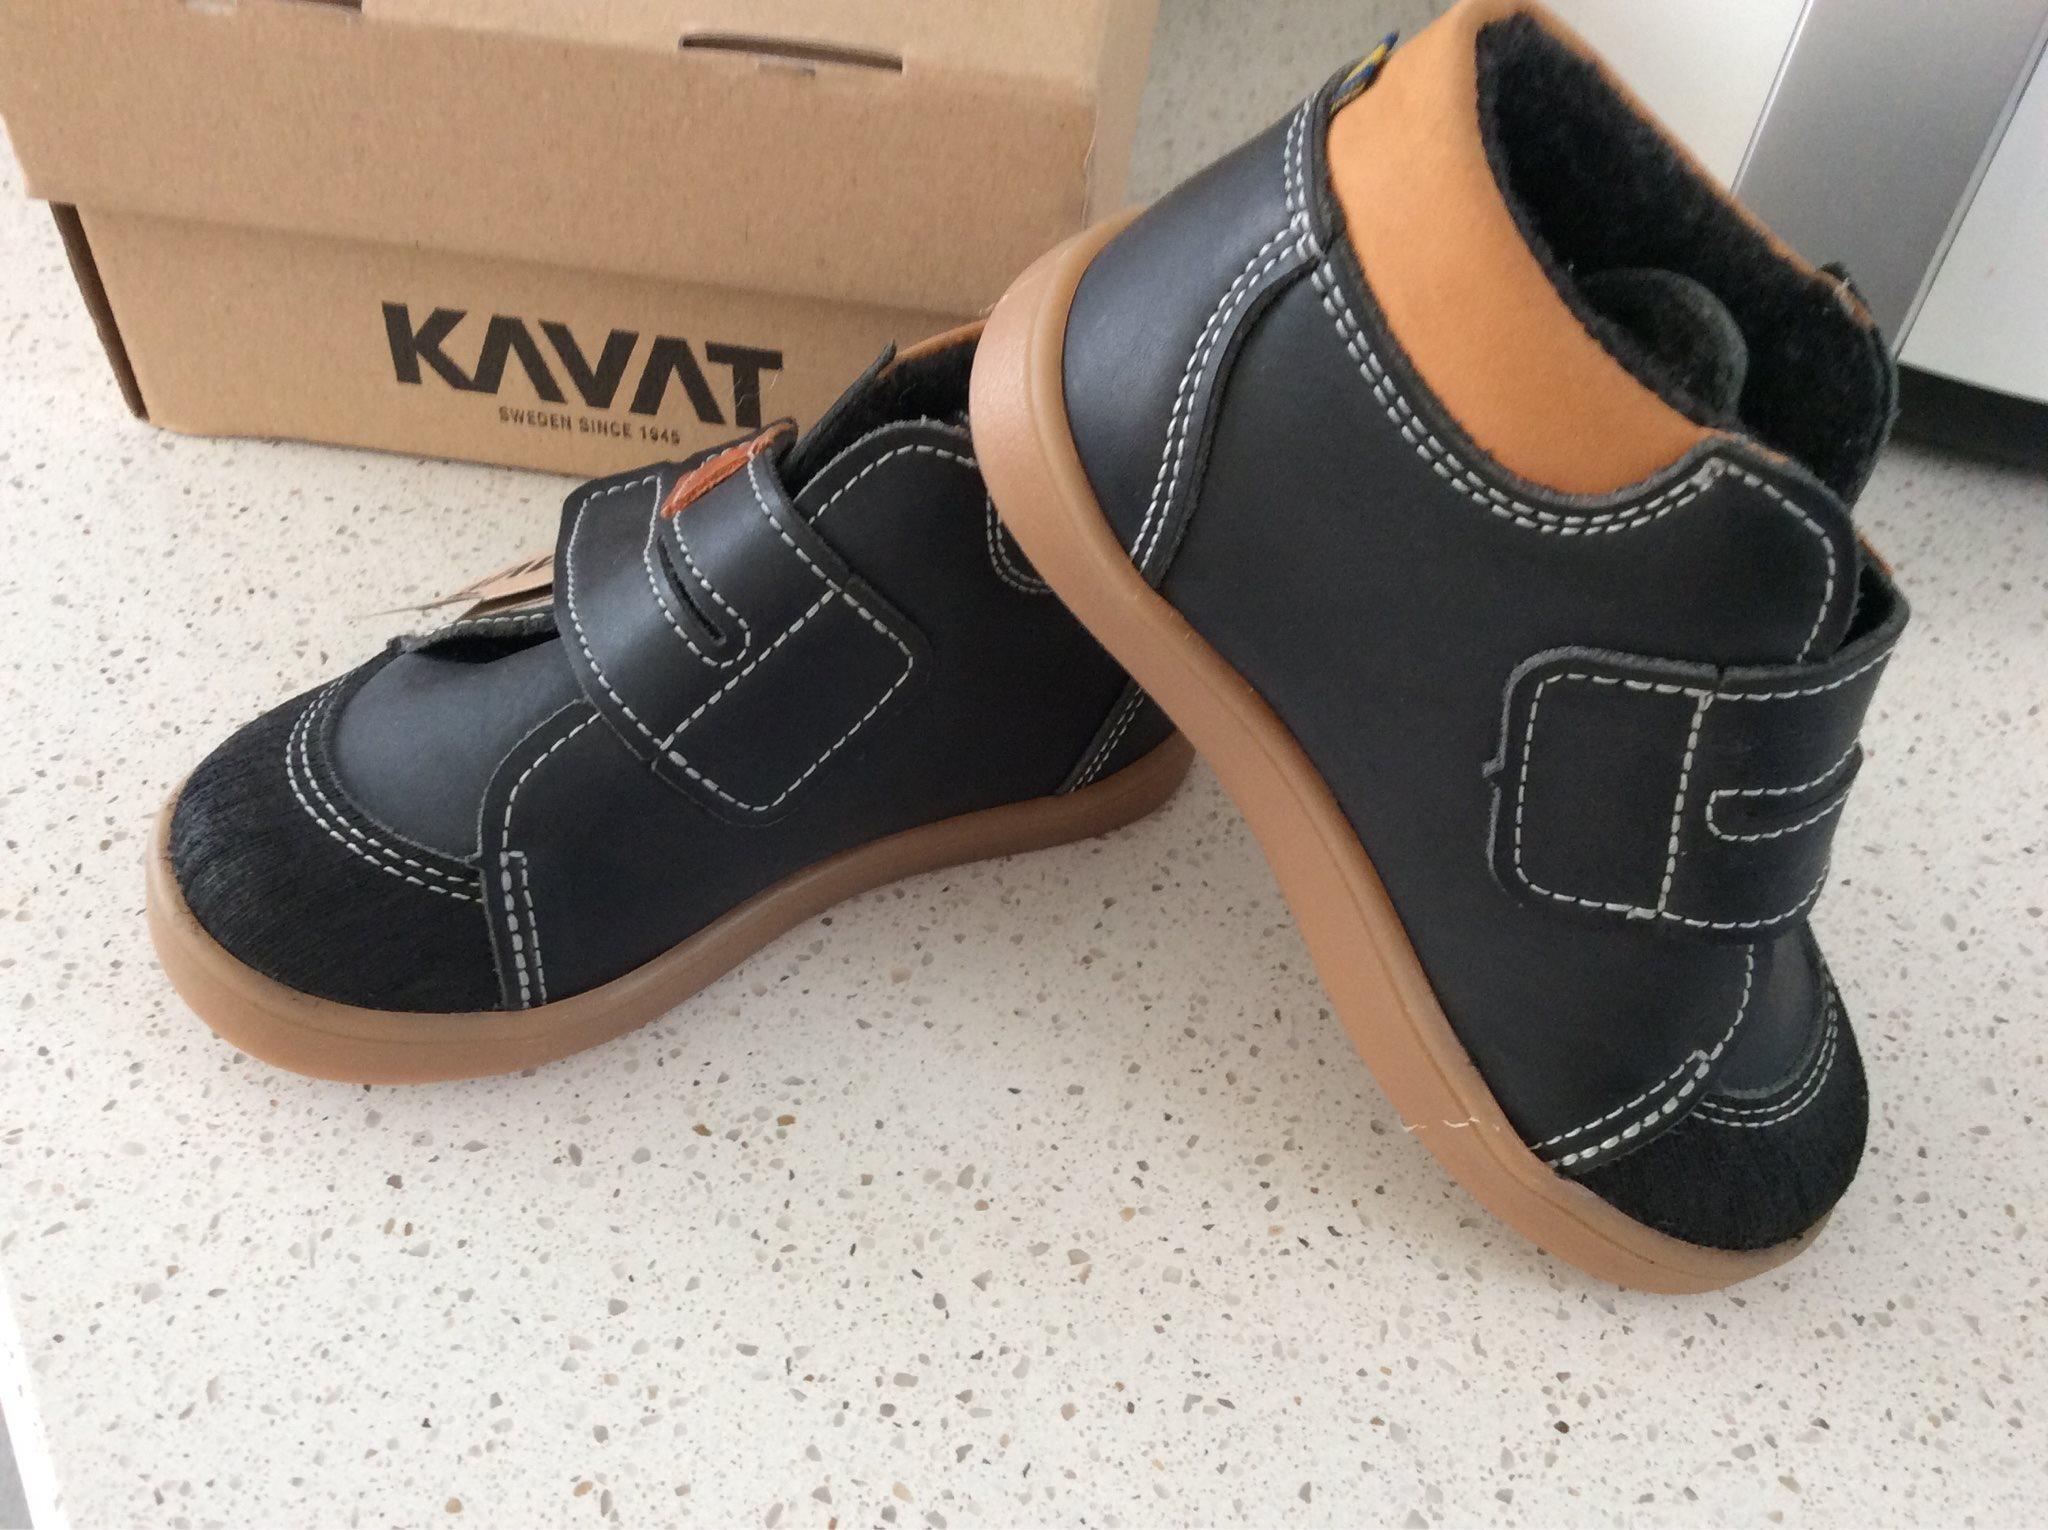 16bf20425d2 Nya skor, strl 24, Kavat Fiskeby XC , svarta (340482446) ᐈ Köp på ...